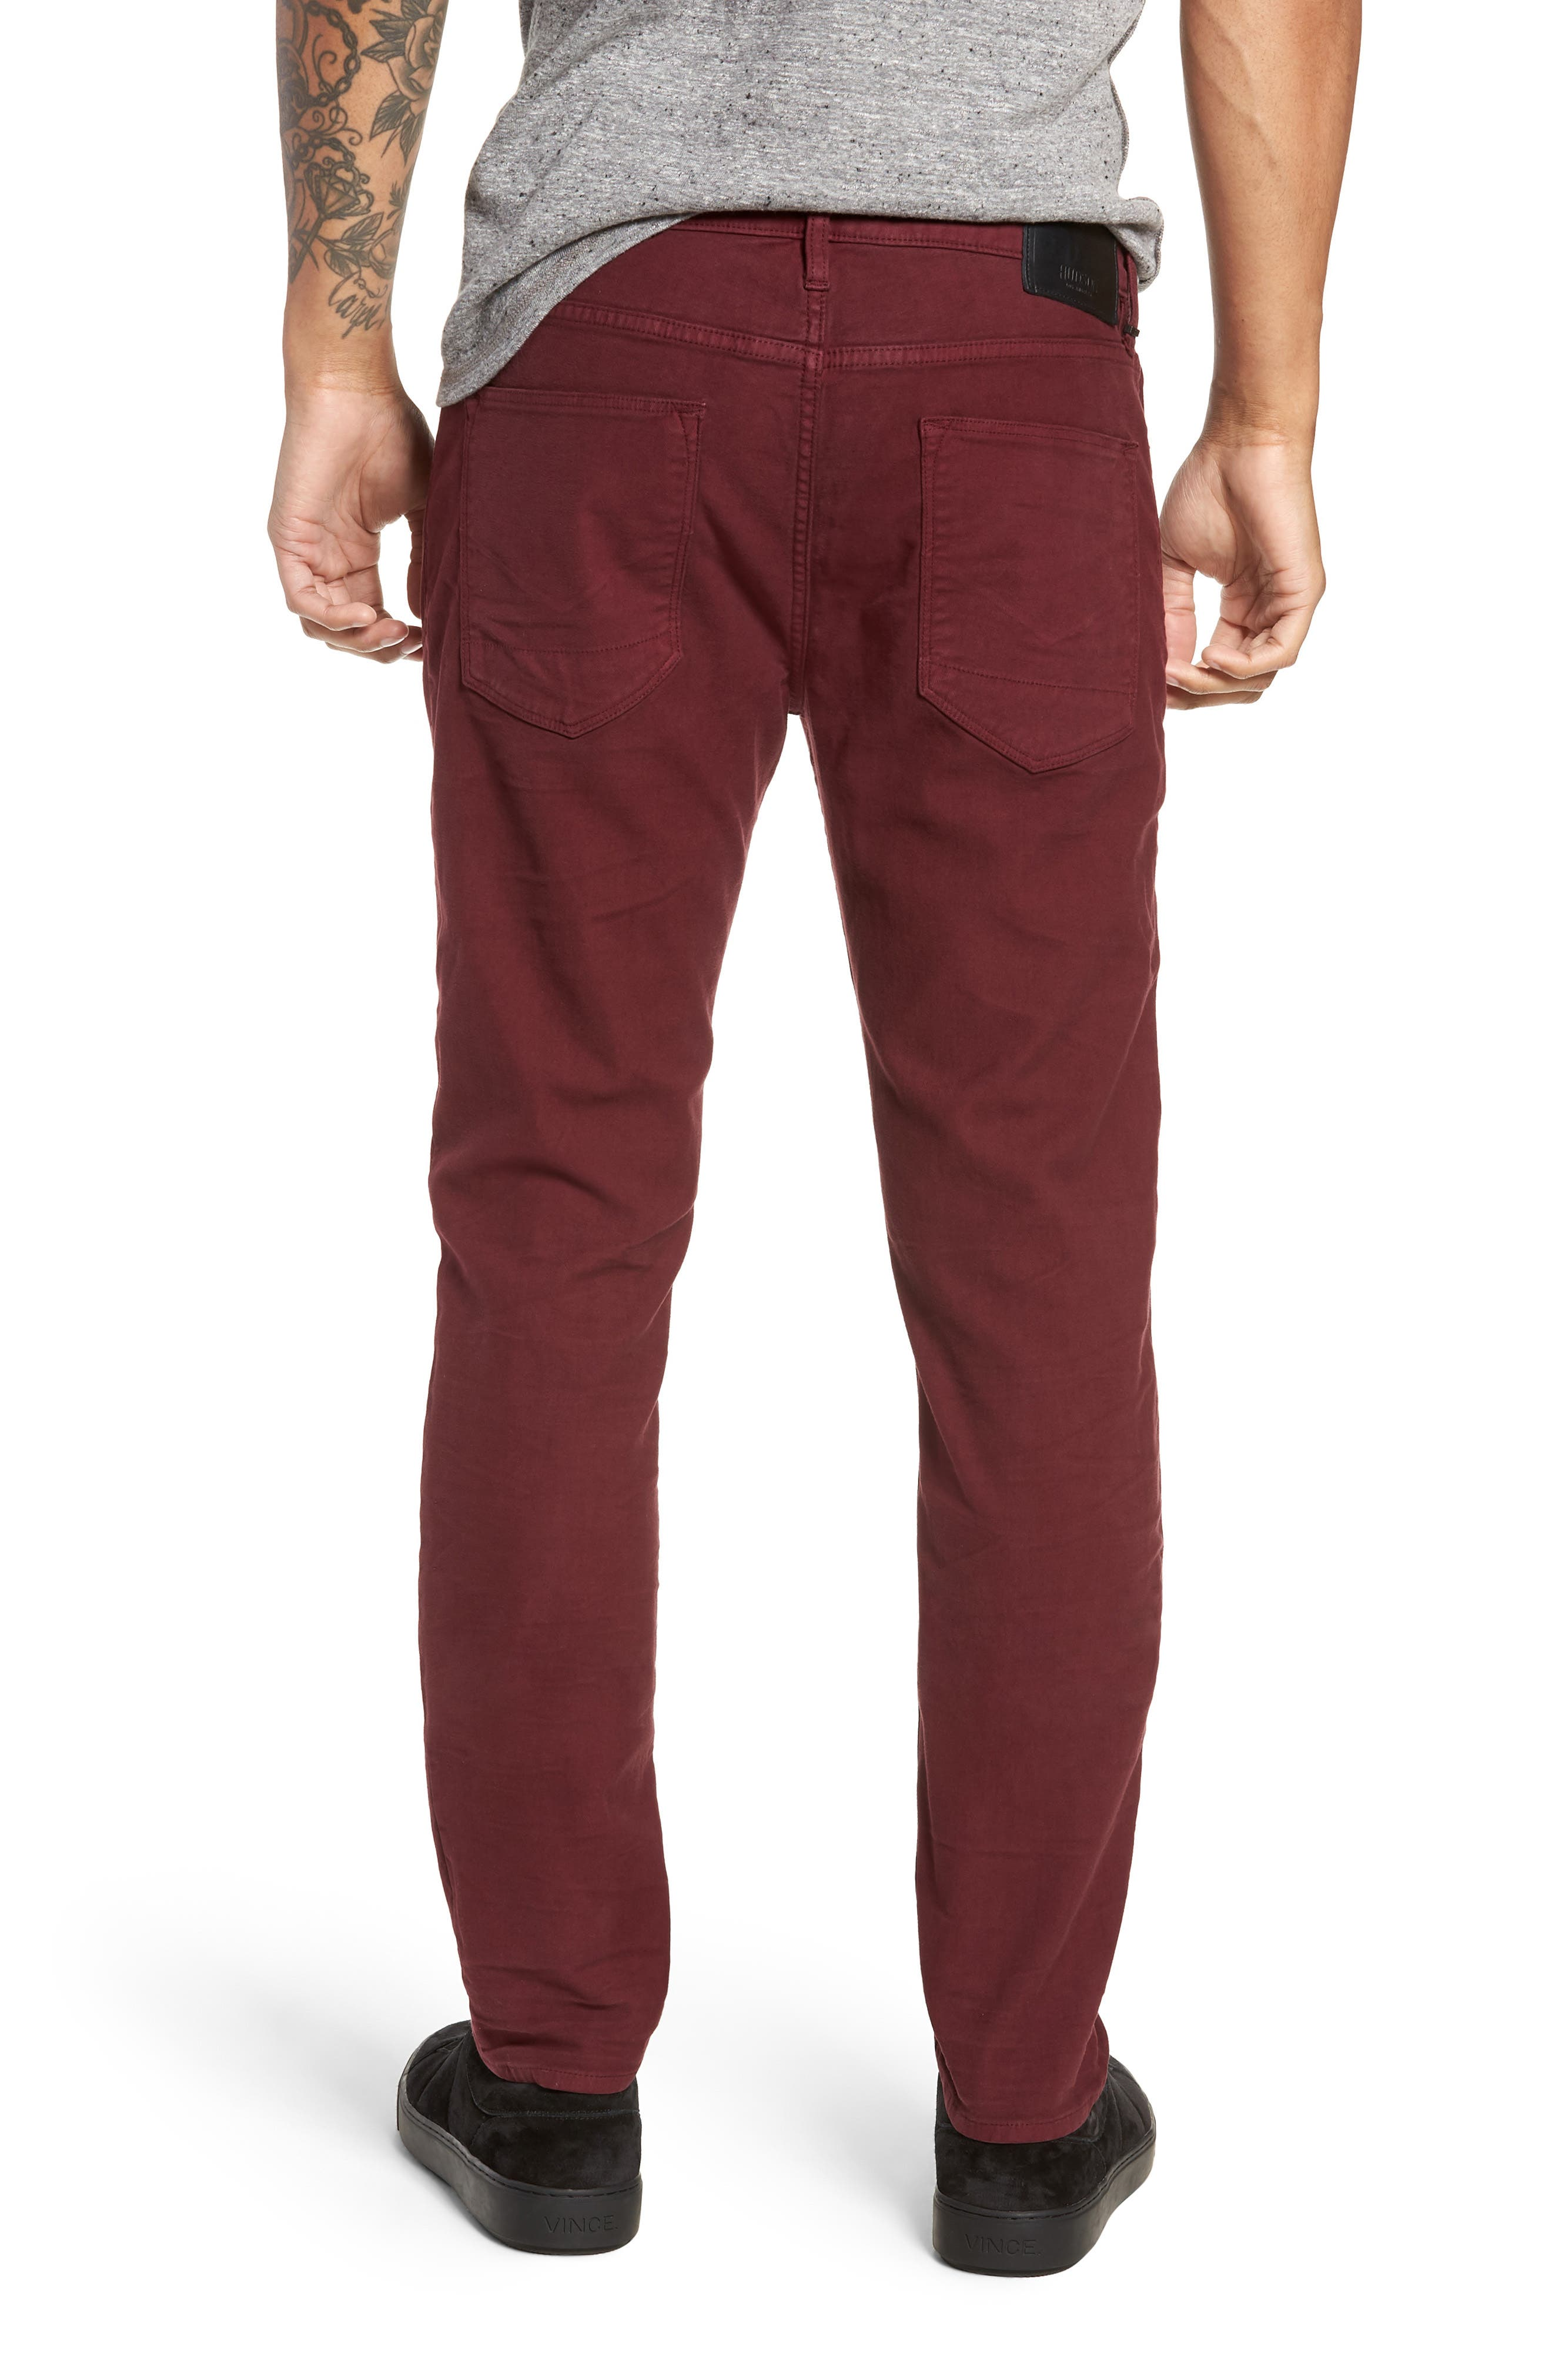 Axl Skinny Fit Twill Jeans,                             Alternate thumbnail 2, color,                             OXBLOOD